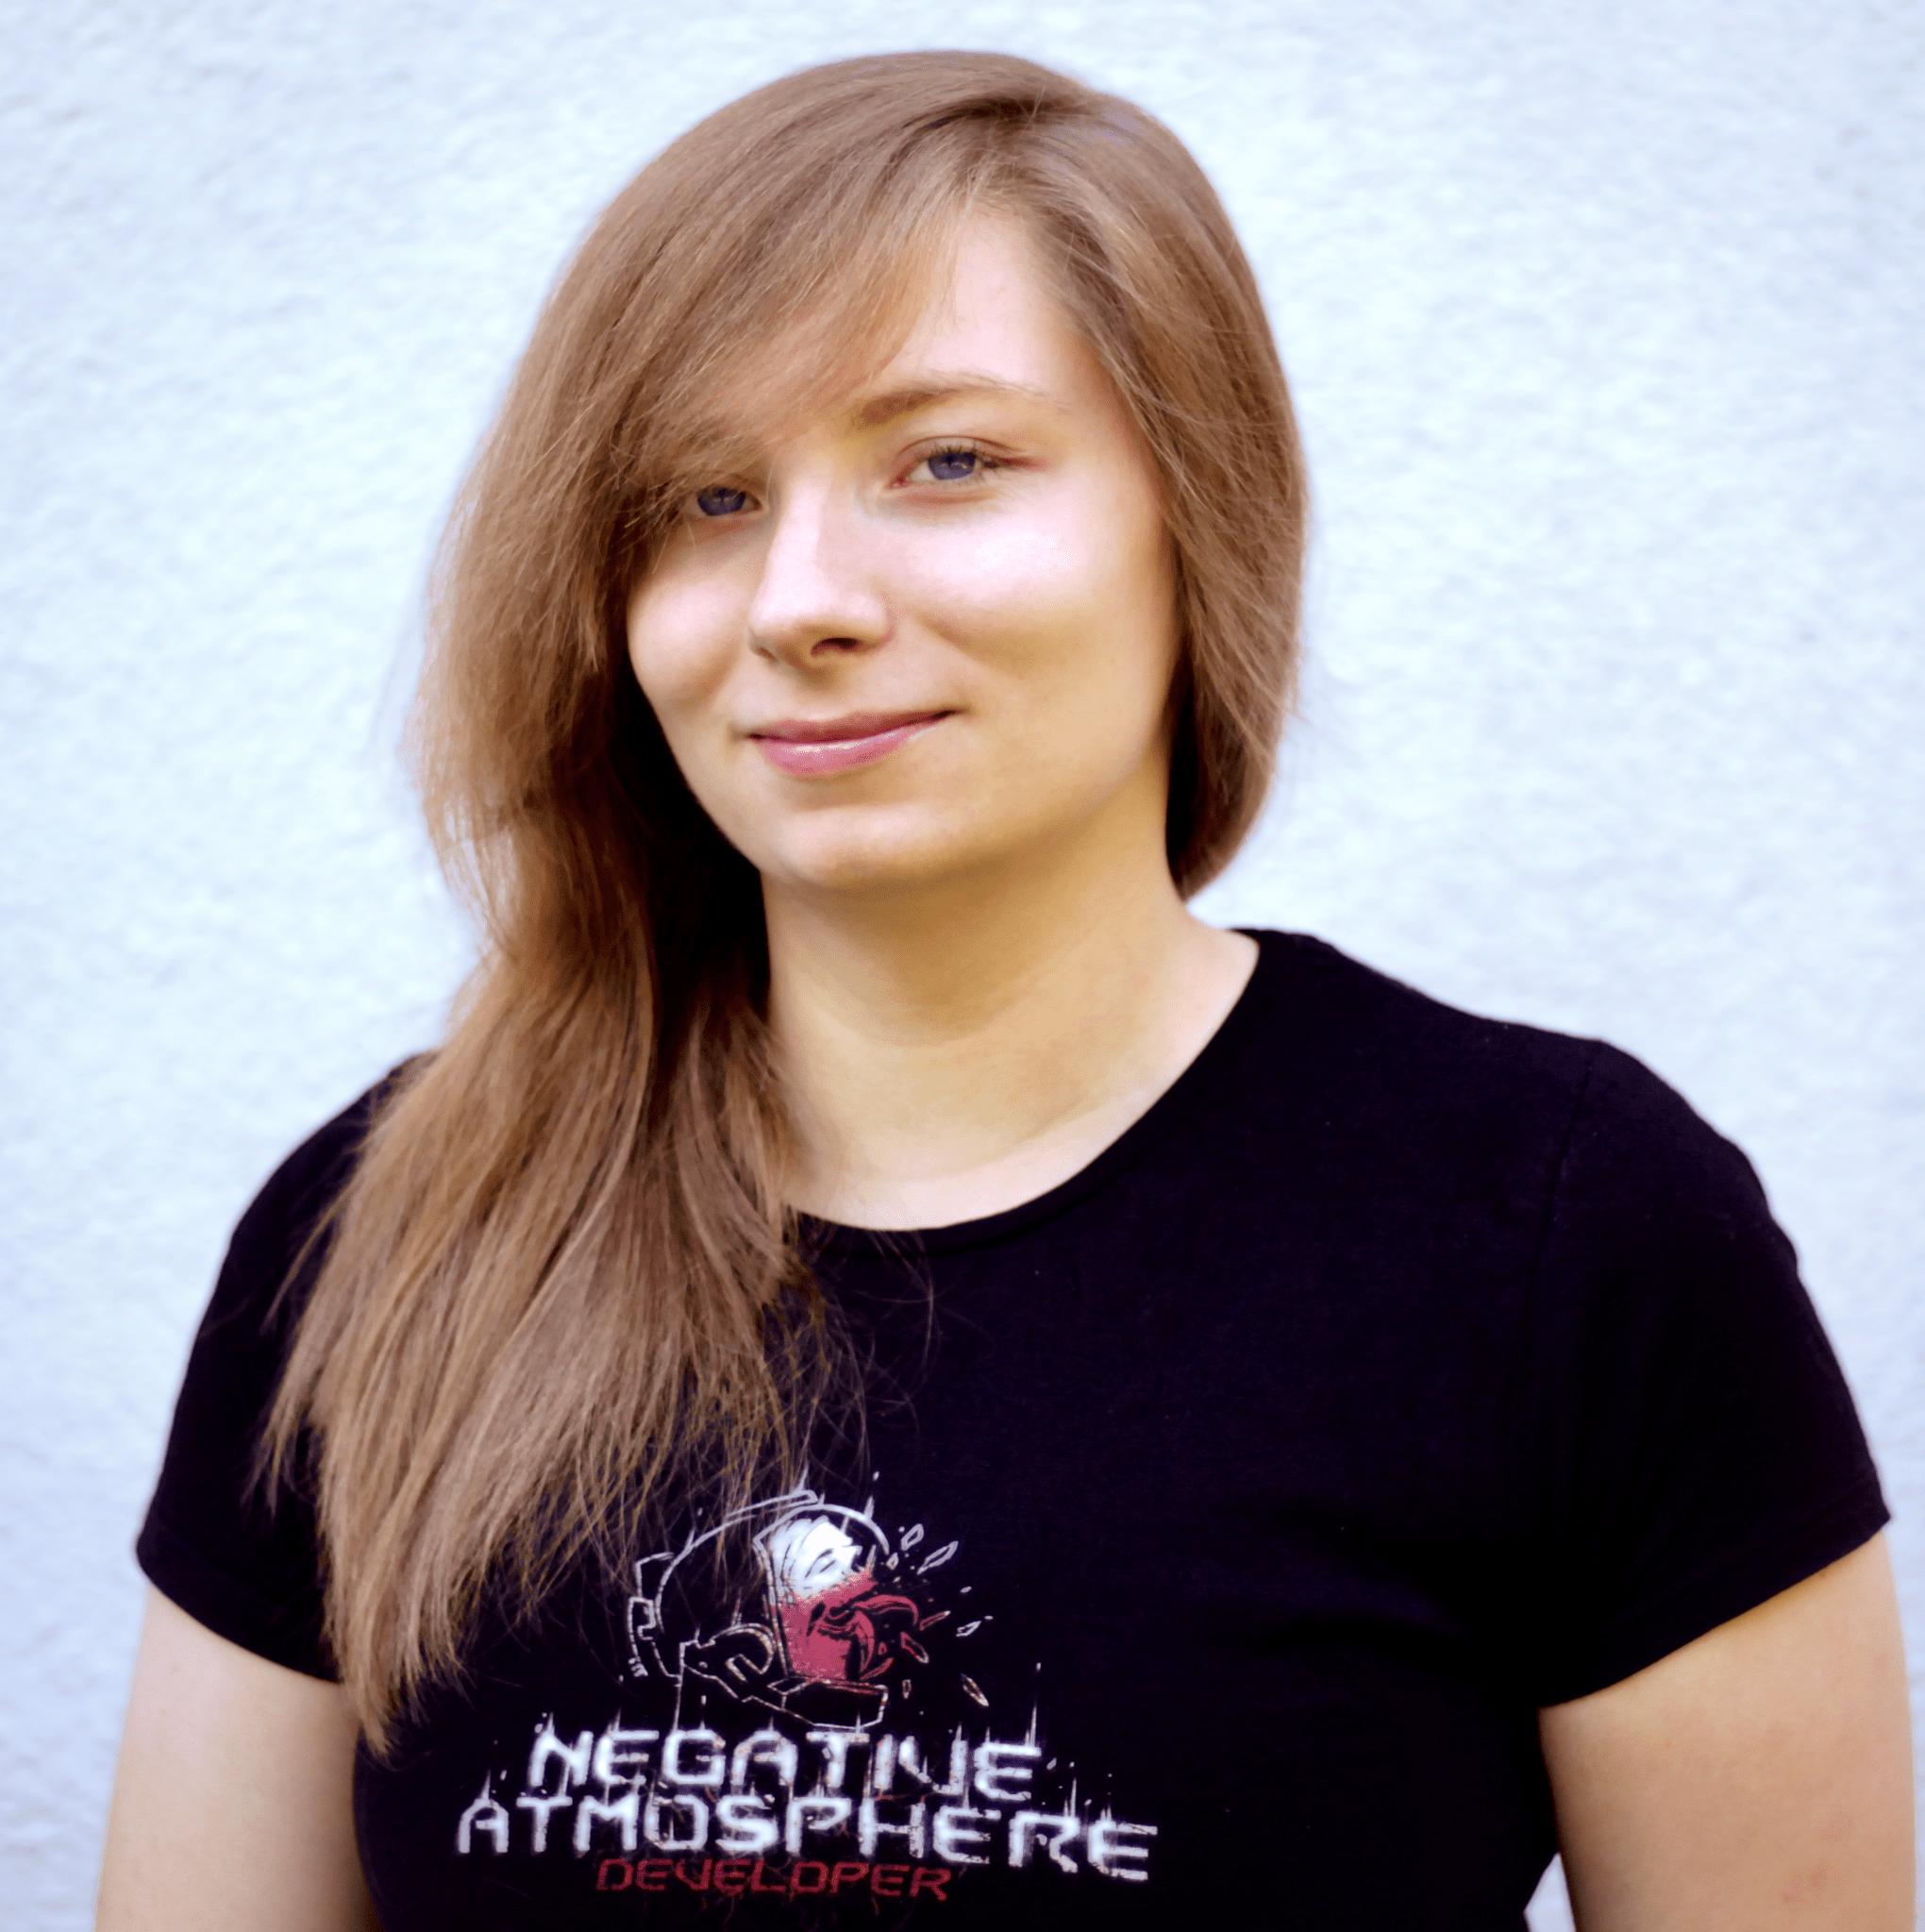 Anita Hackstuhl